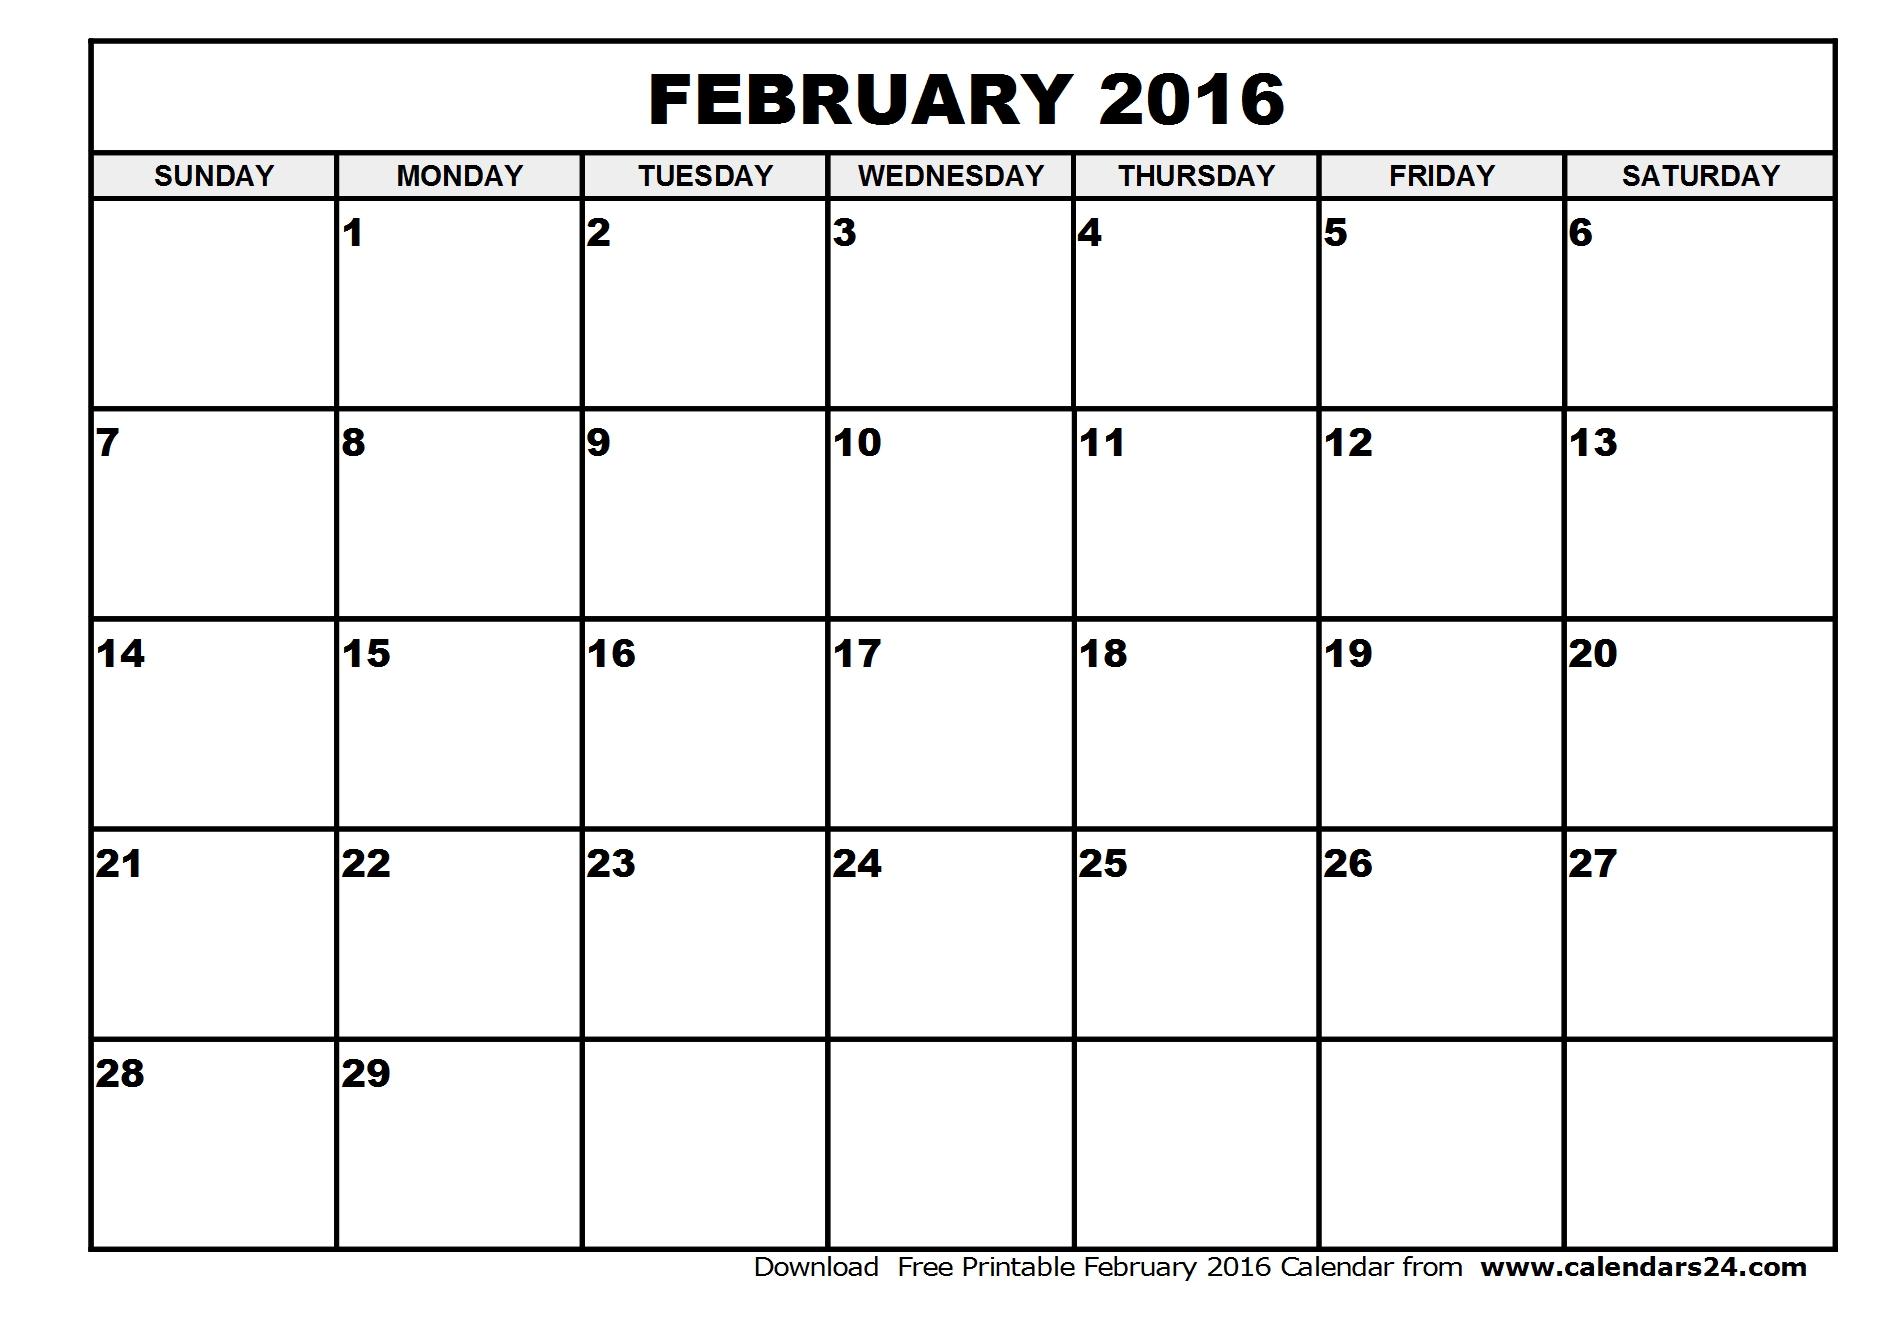 8 Images of February 2016 Printable Calendar Planner